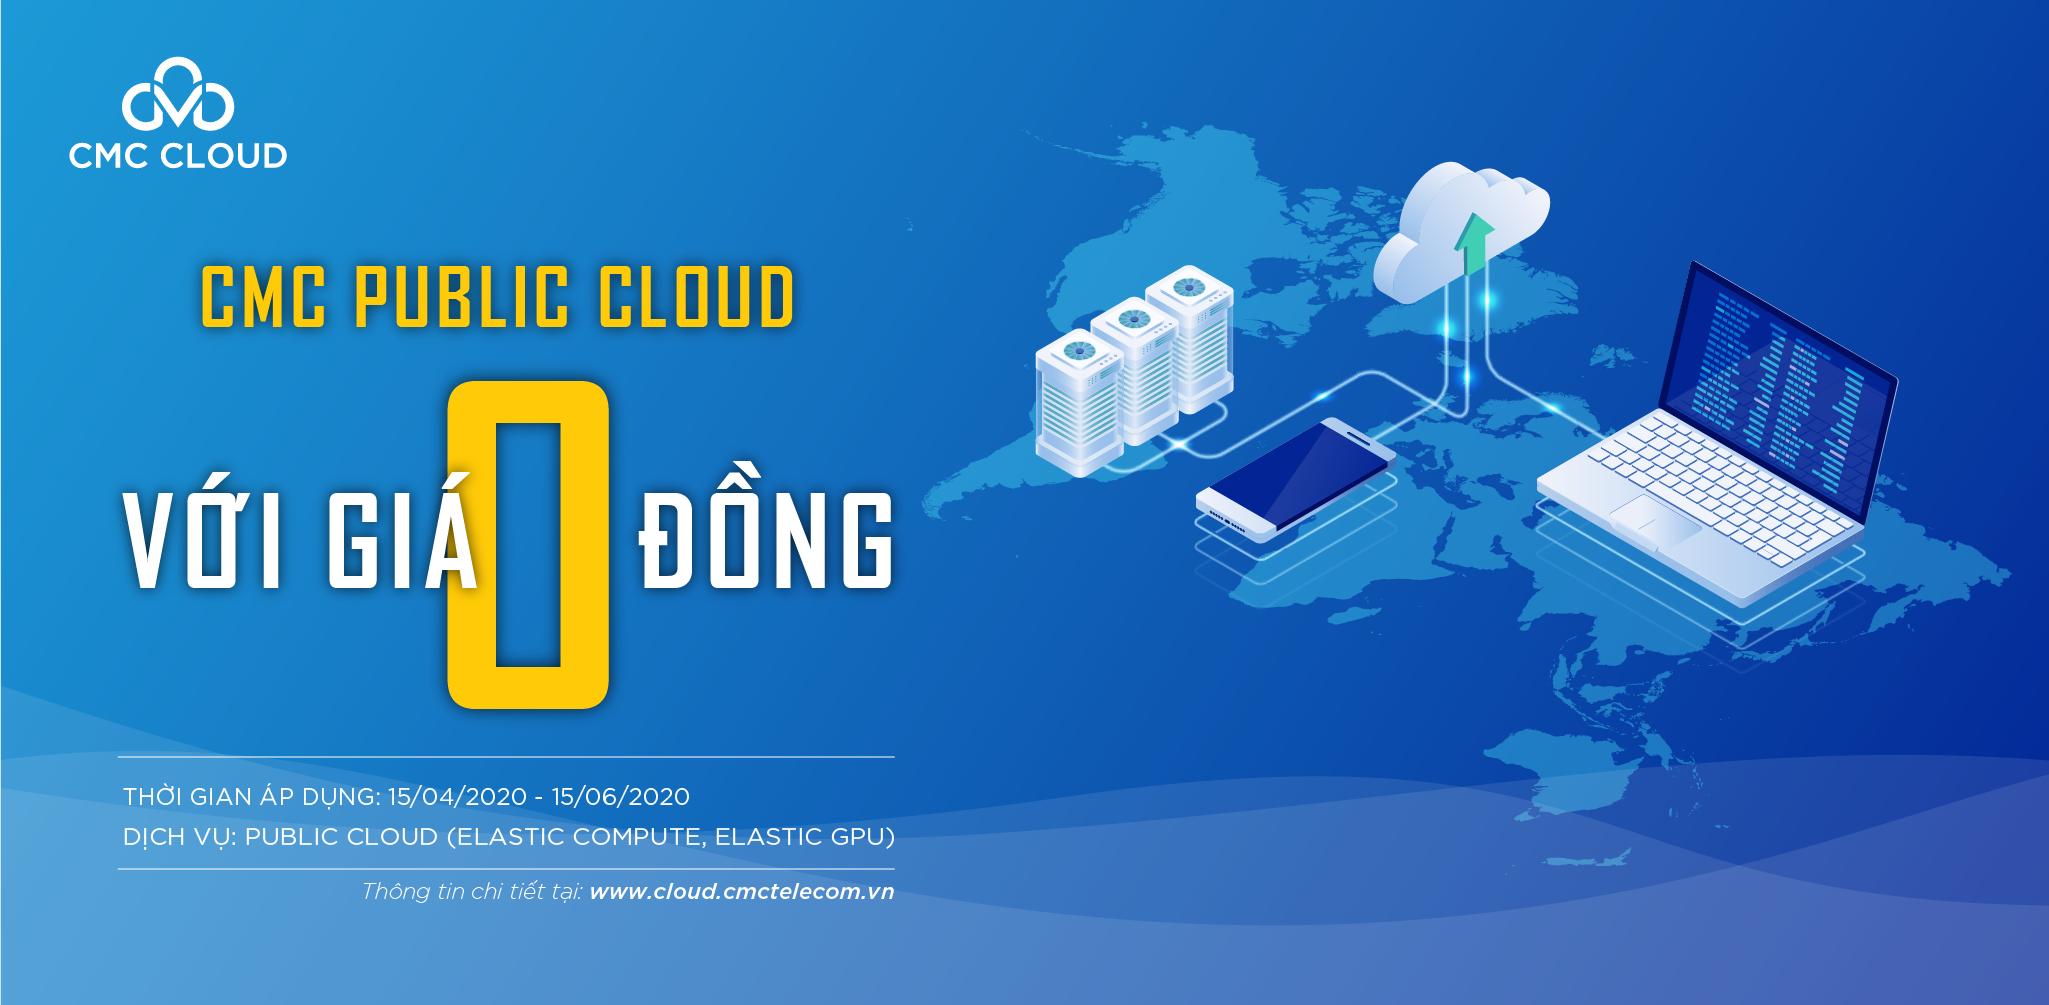 Dùng CMC Public Cloud với giá 0 đồng - CMC Telecom   Data – Internet – Data Center - Voice – VAS